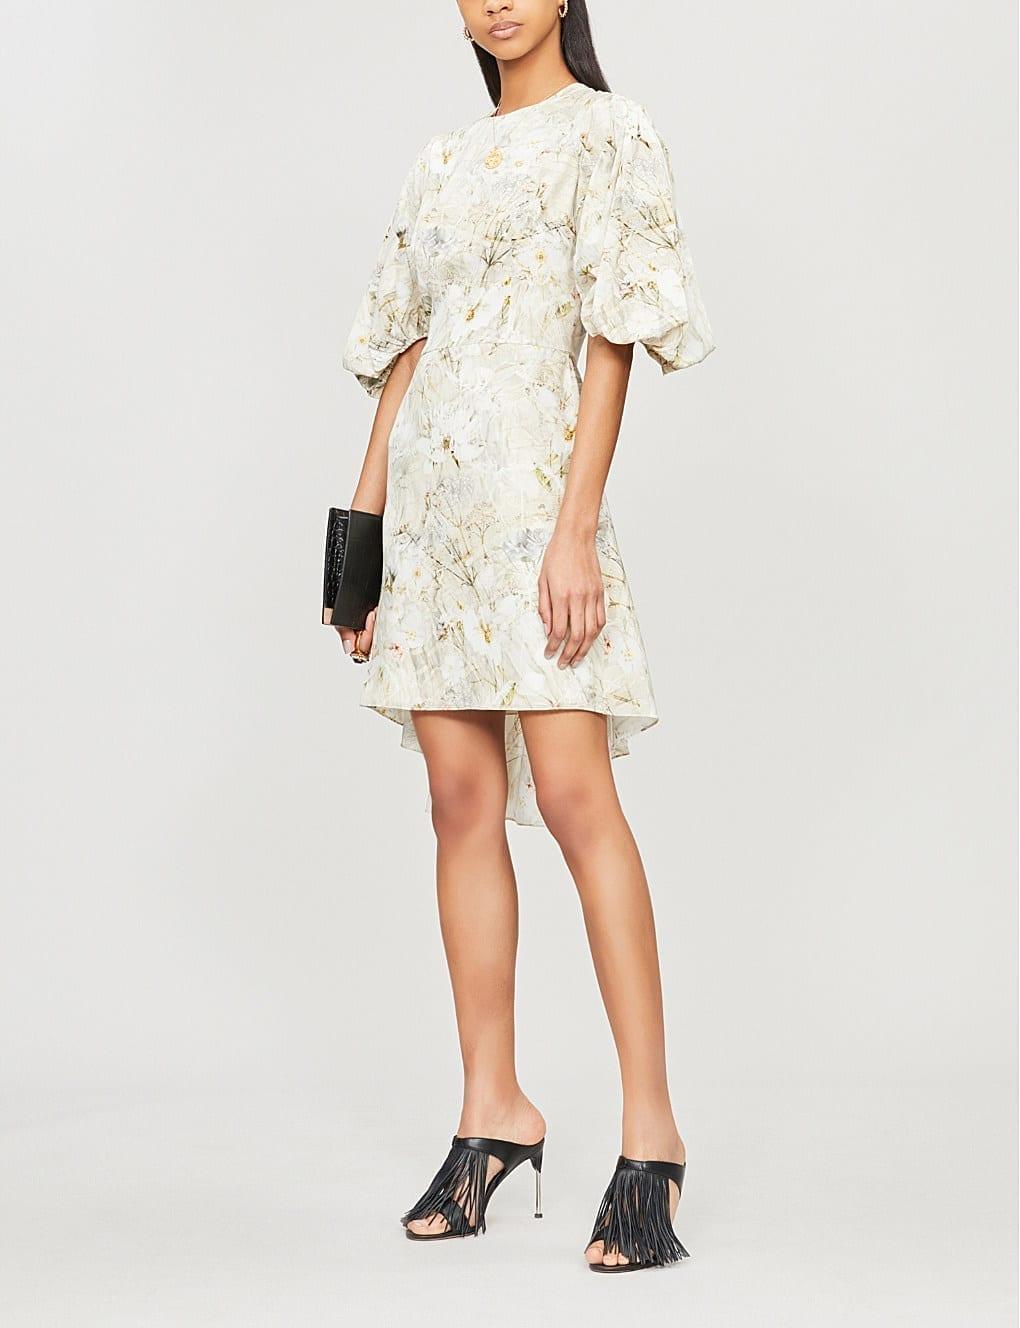 ALEXANDER MCQUEEN Ophelia Floral-Print Silk Ivory Dress